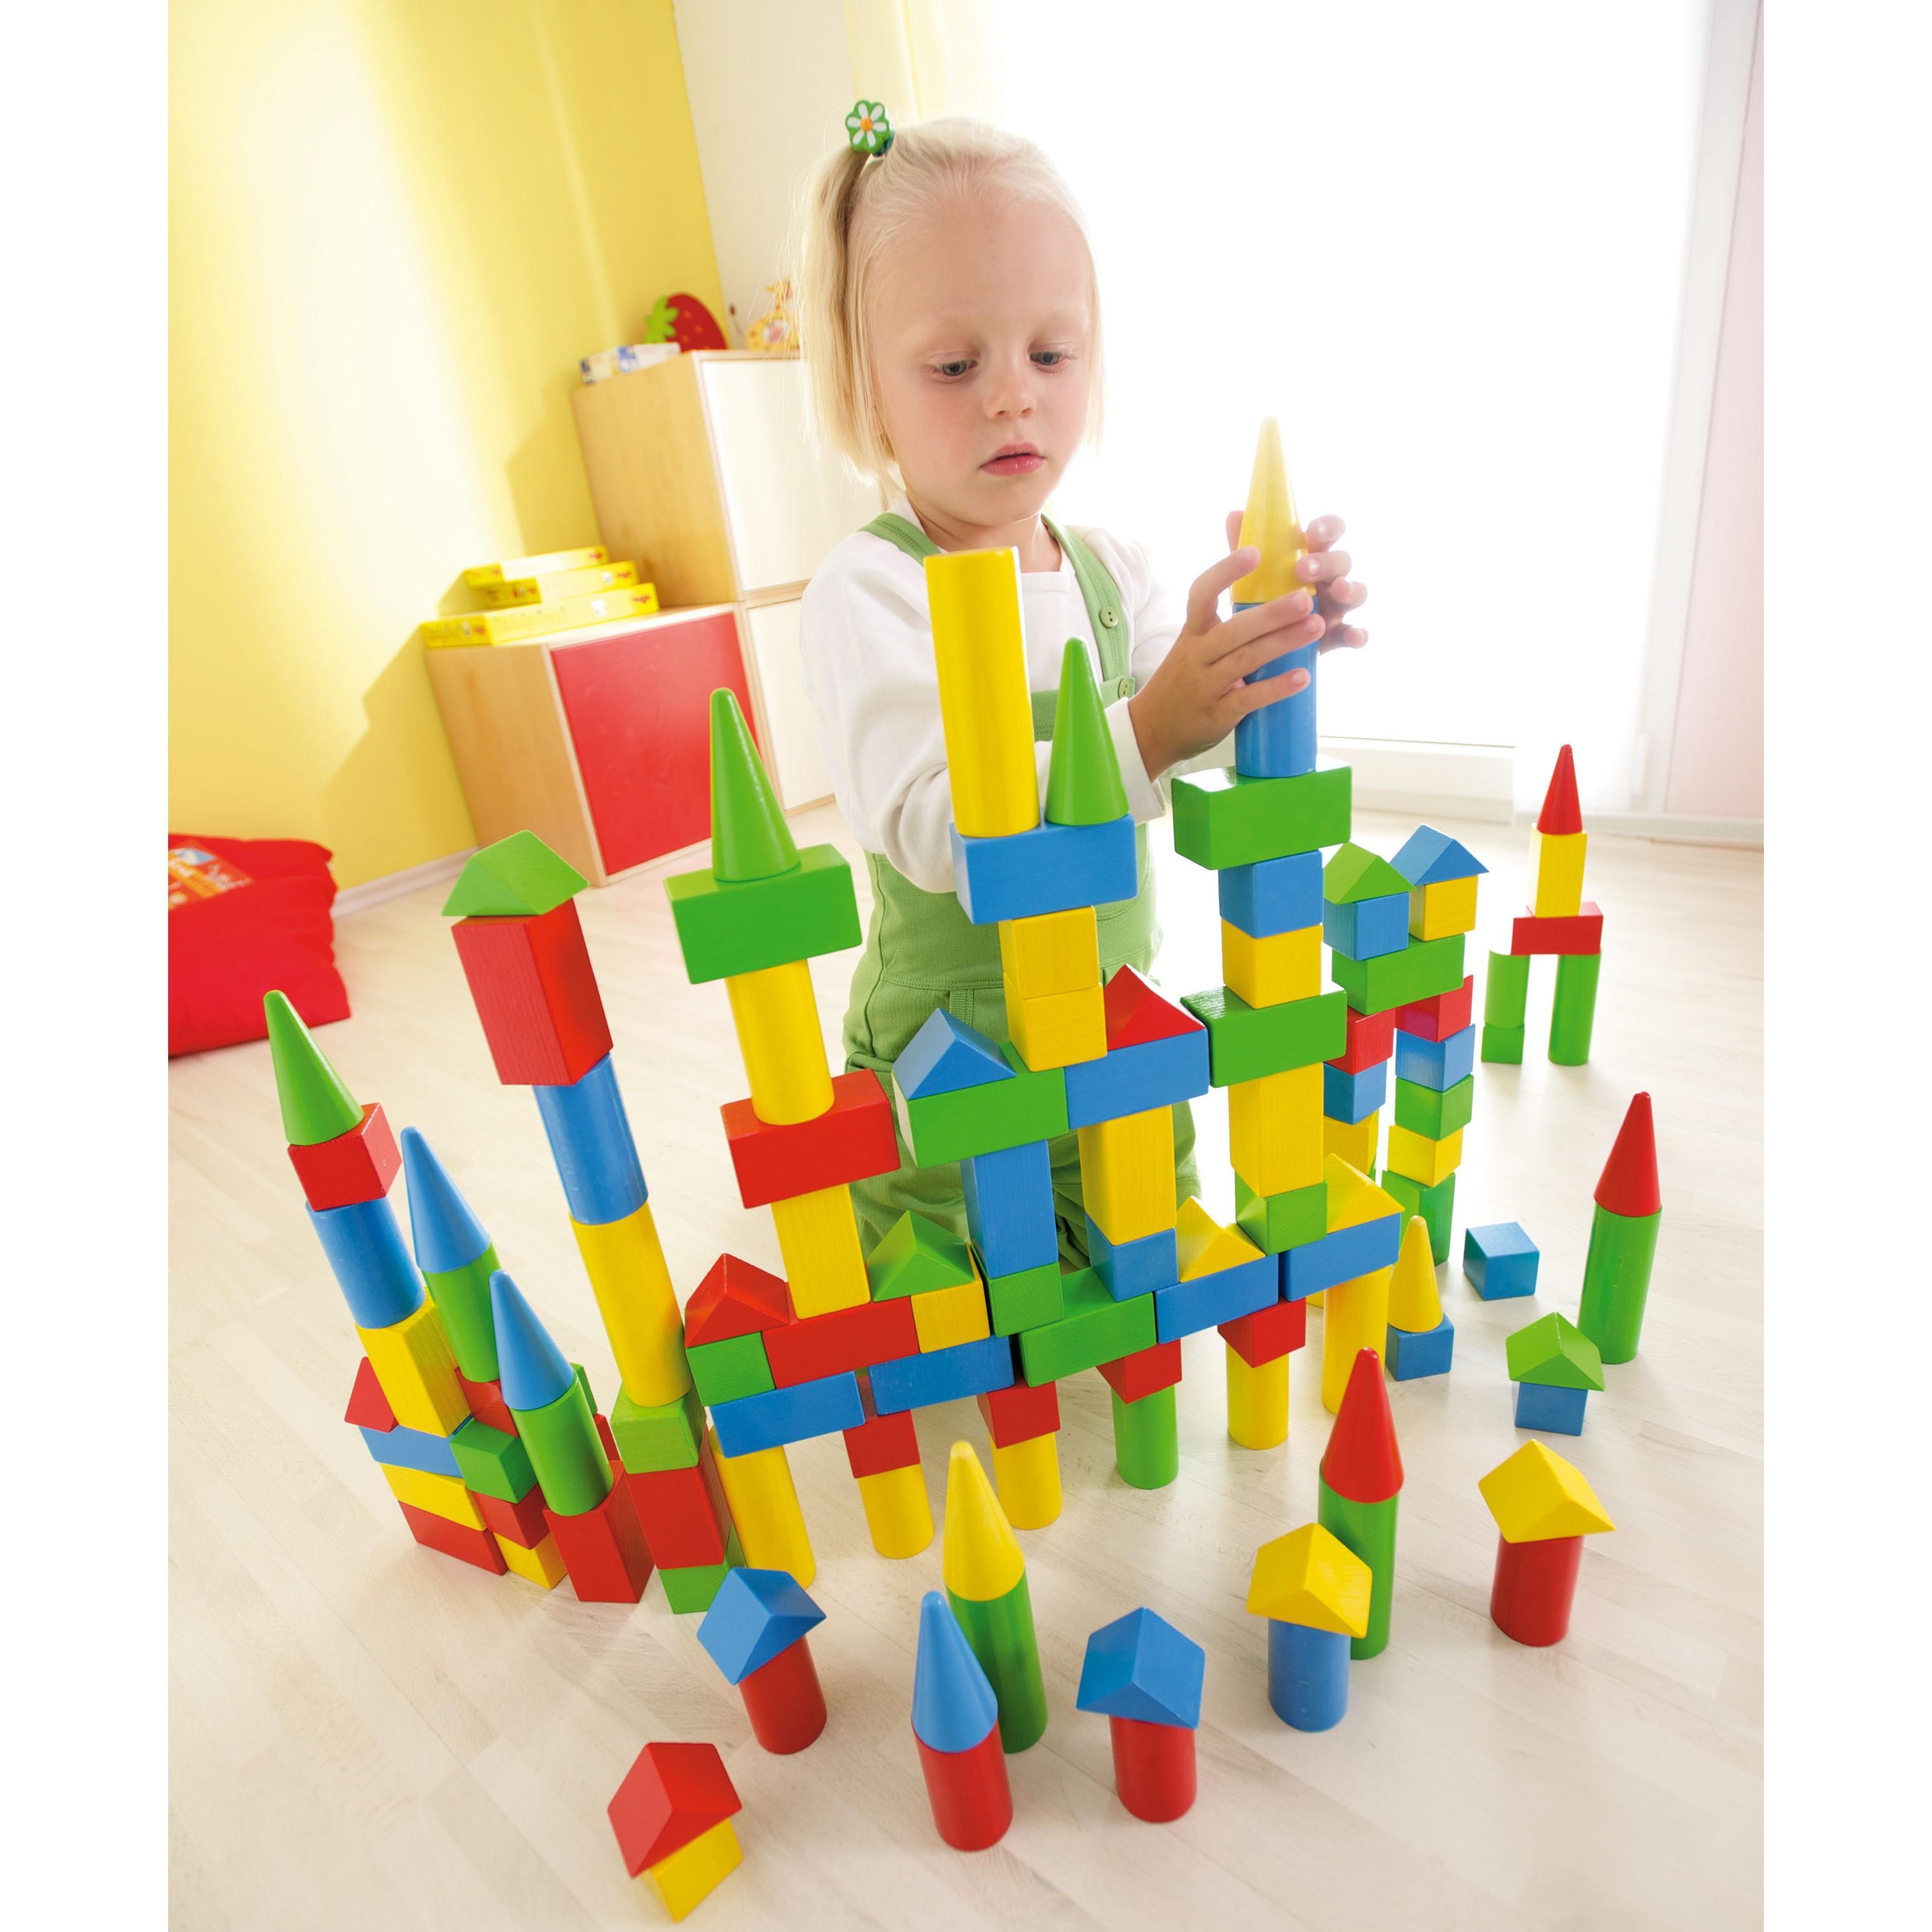 Colourful Rectangle Building Blocks